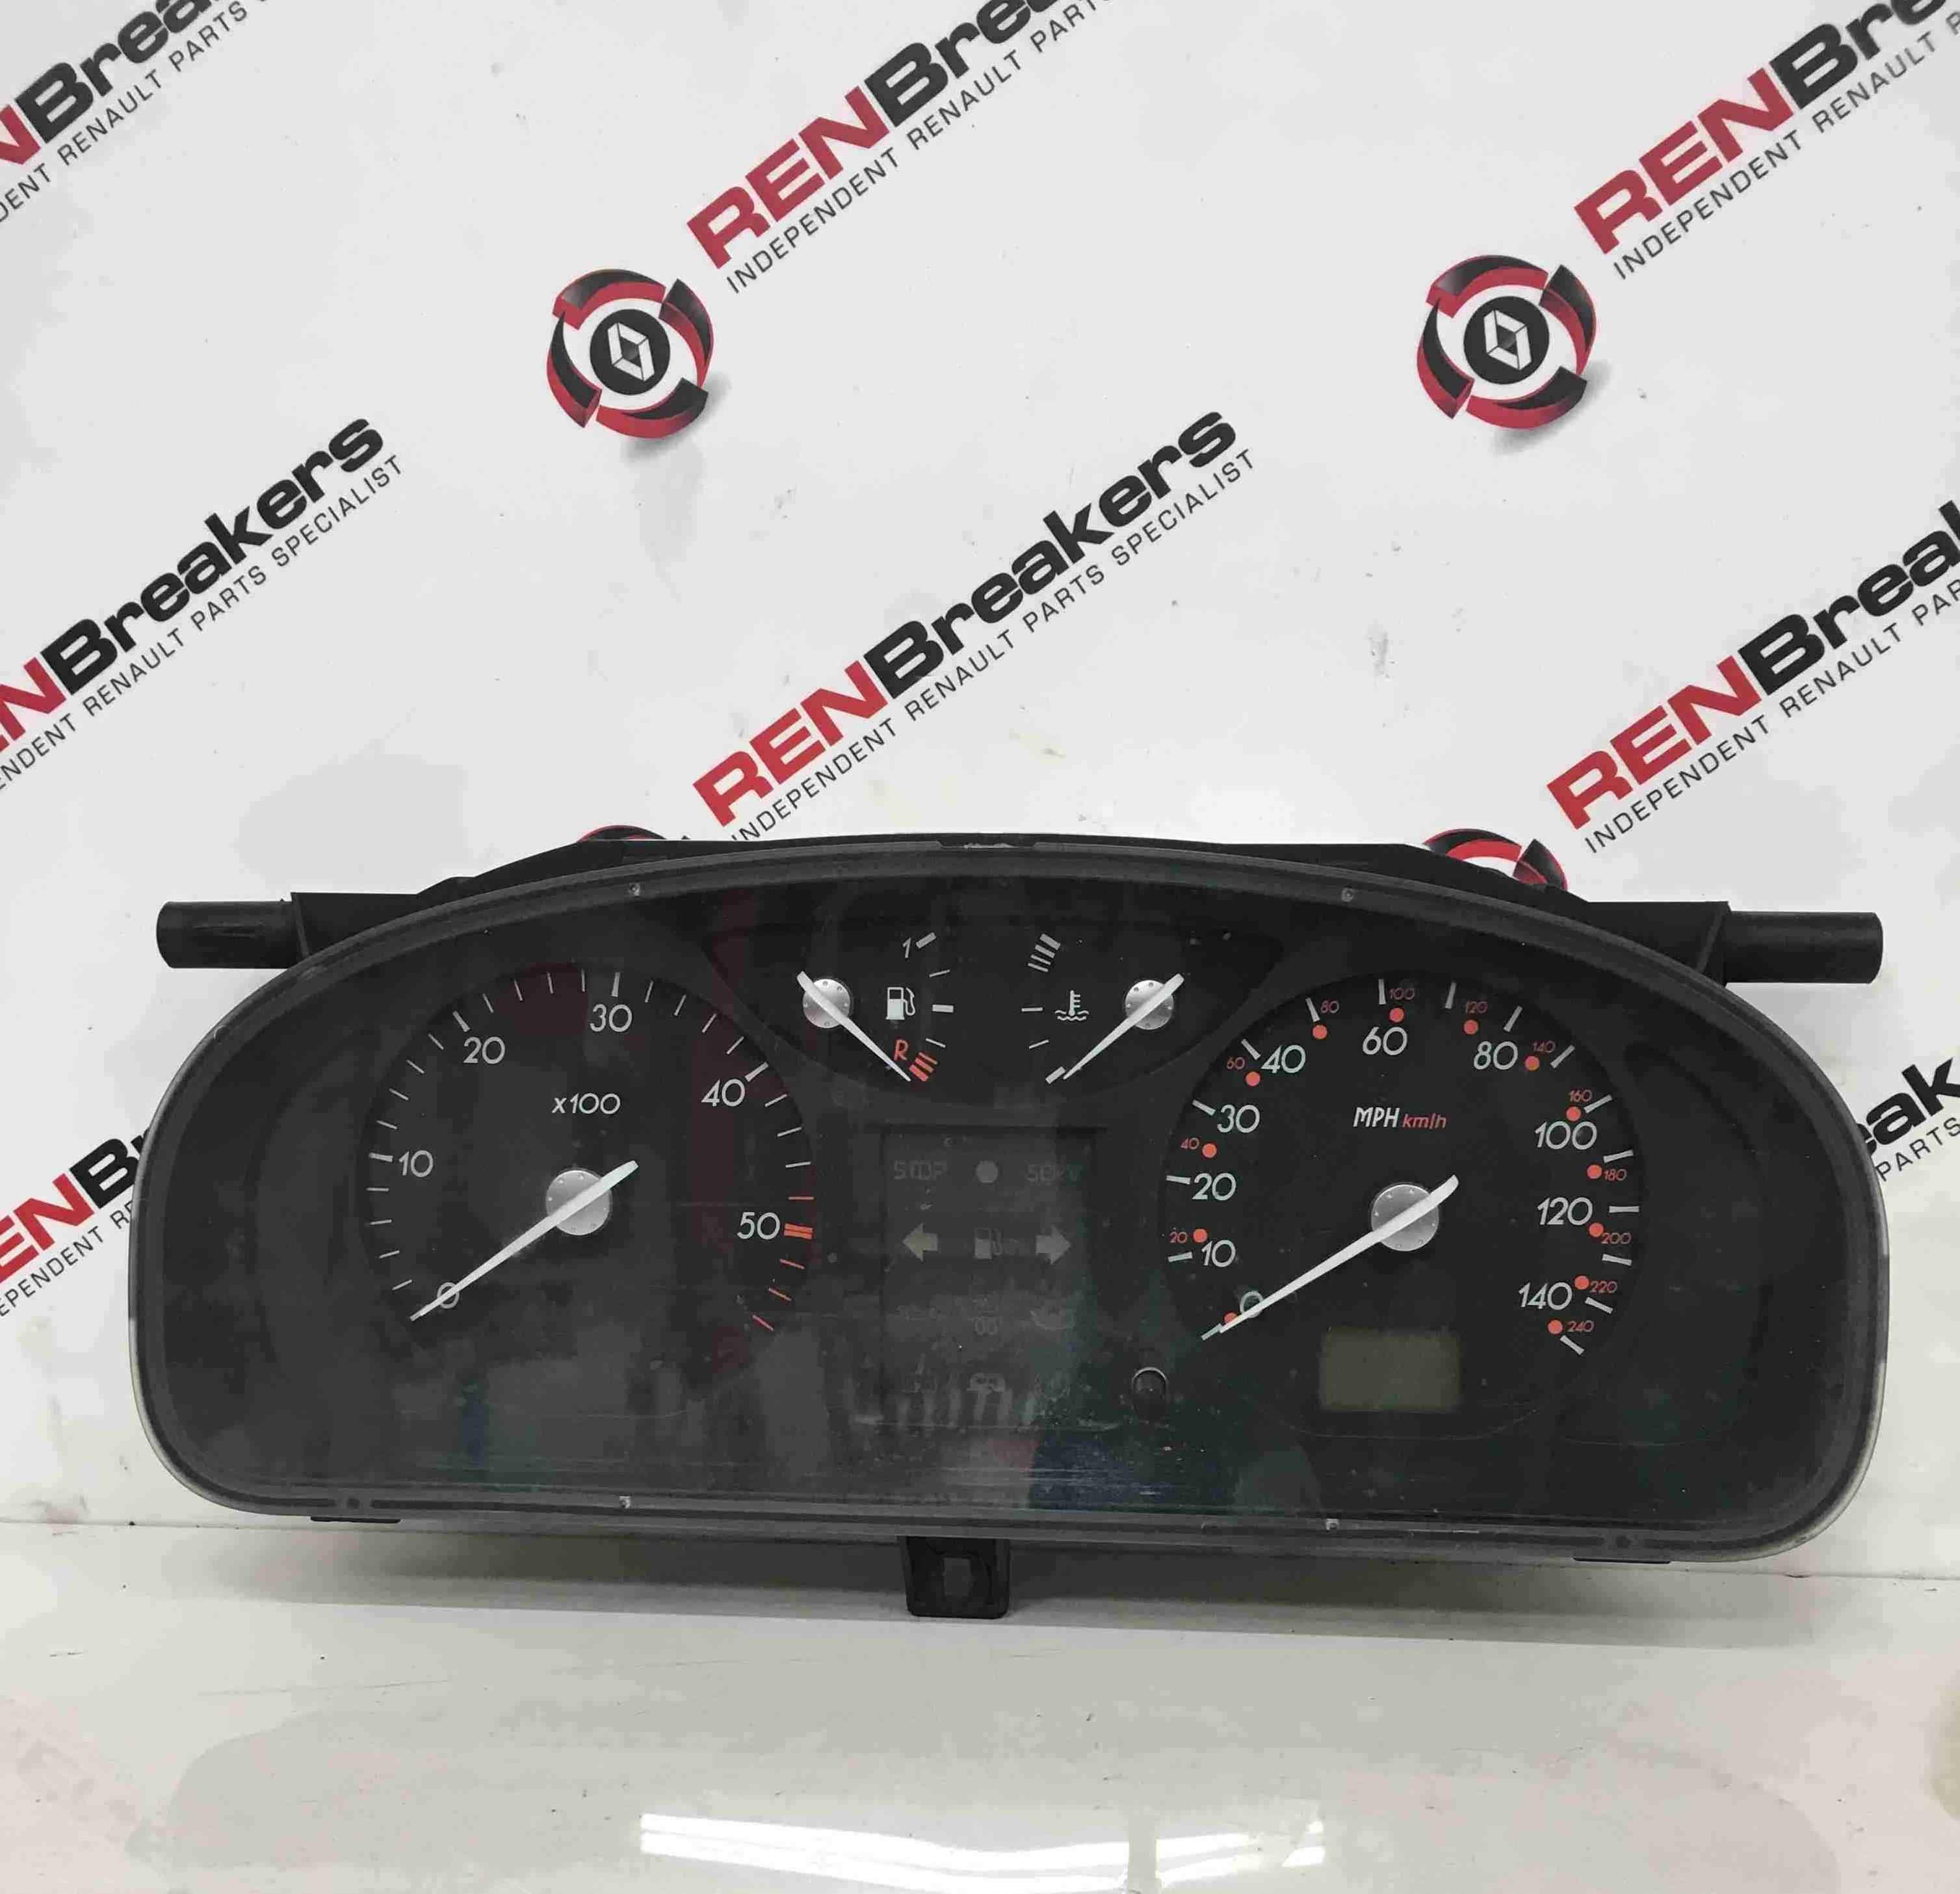 Renault Laguna 2001-2005 Instrument Panel Dials Gauges Clocks Cluster 149K